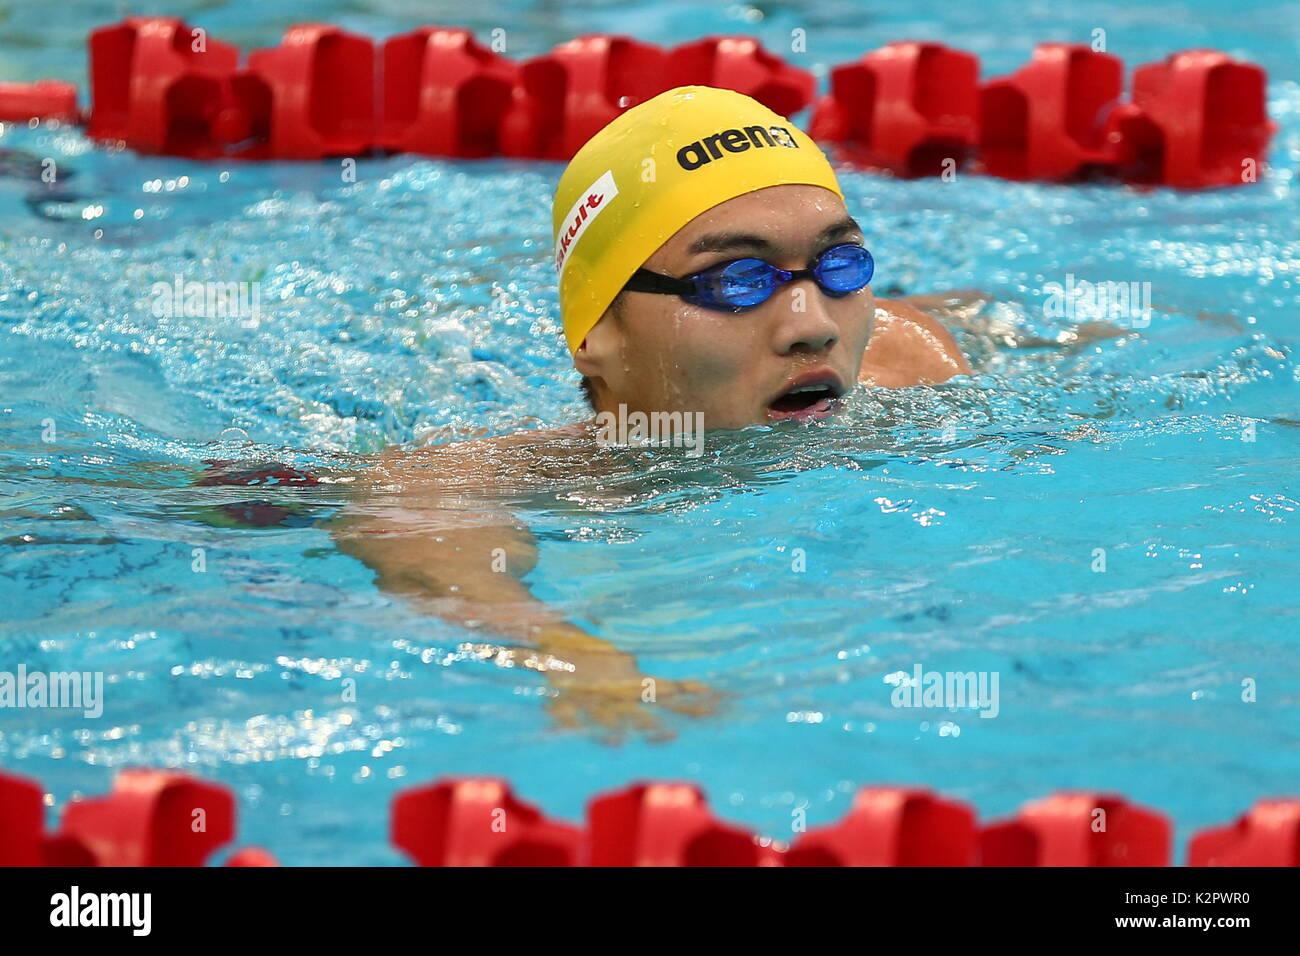 beijing-swimmer-boob-teen-blowjob-thumbs